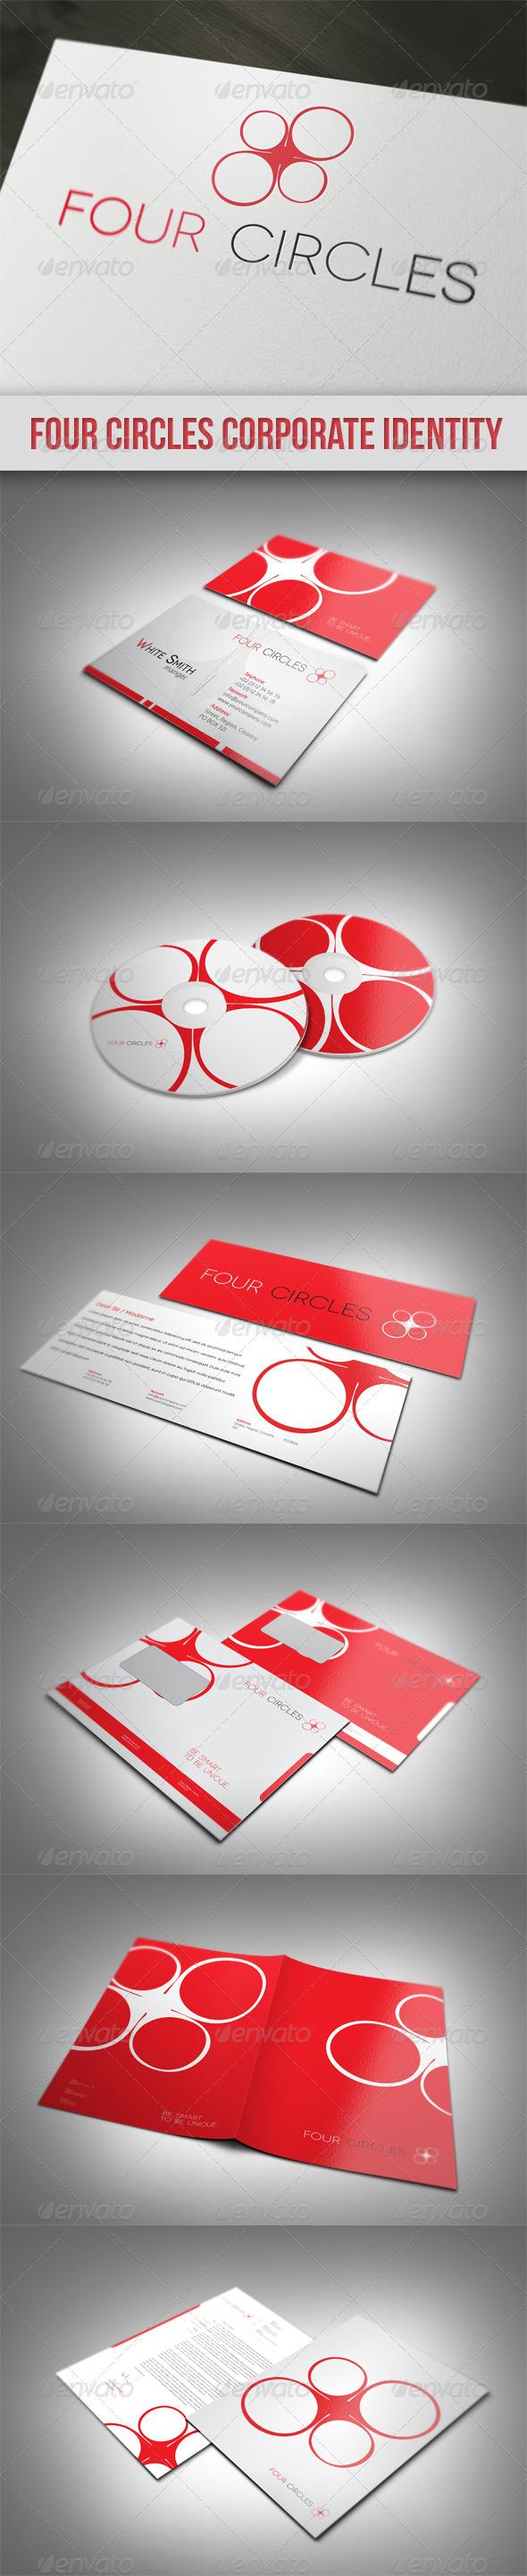 GraphicRiver Four Circles Corporate Identity 1564478